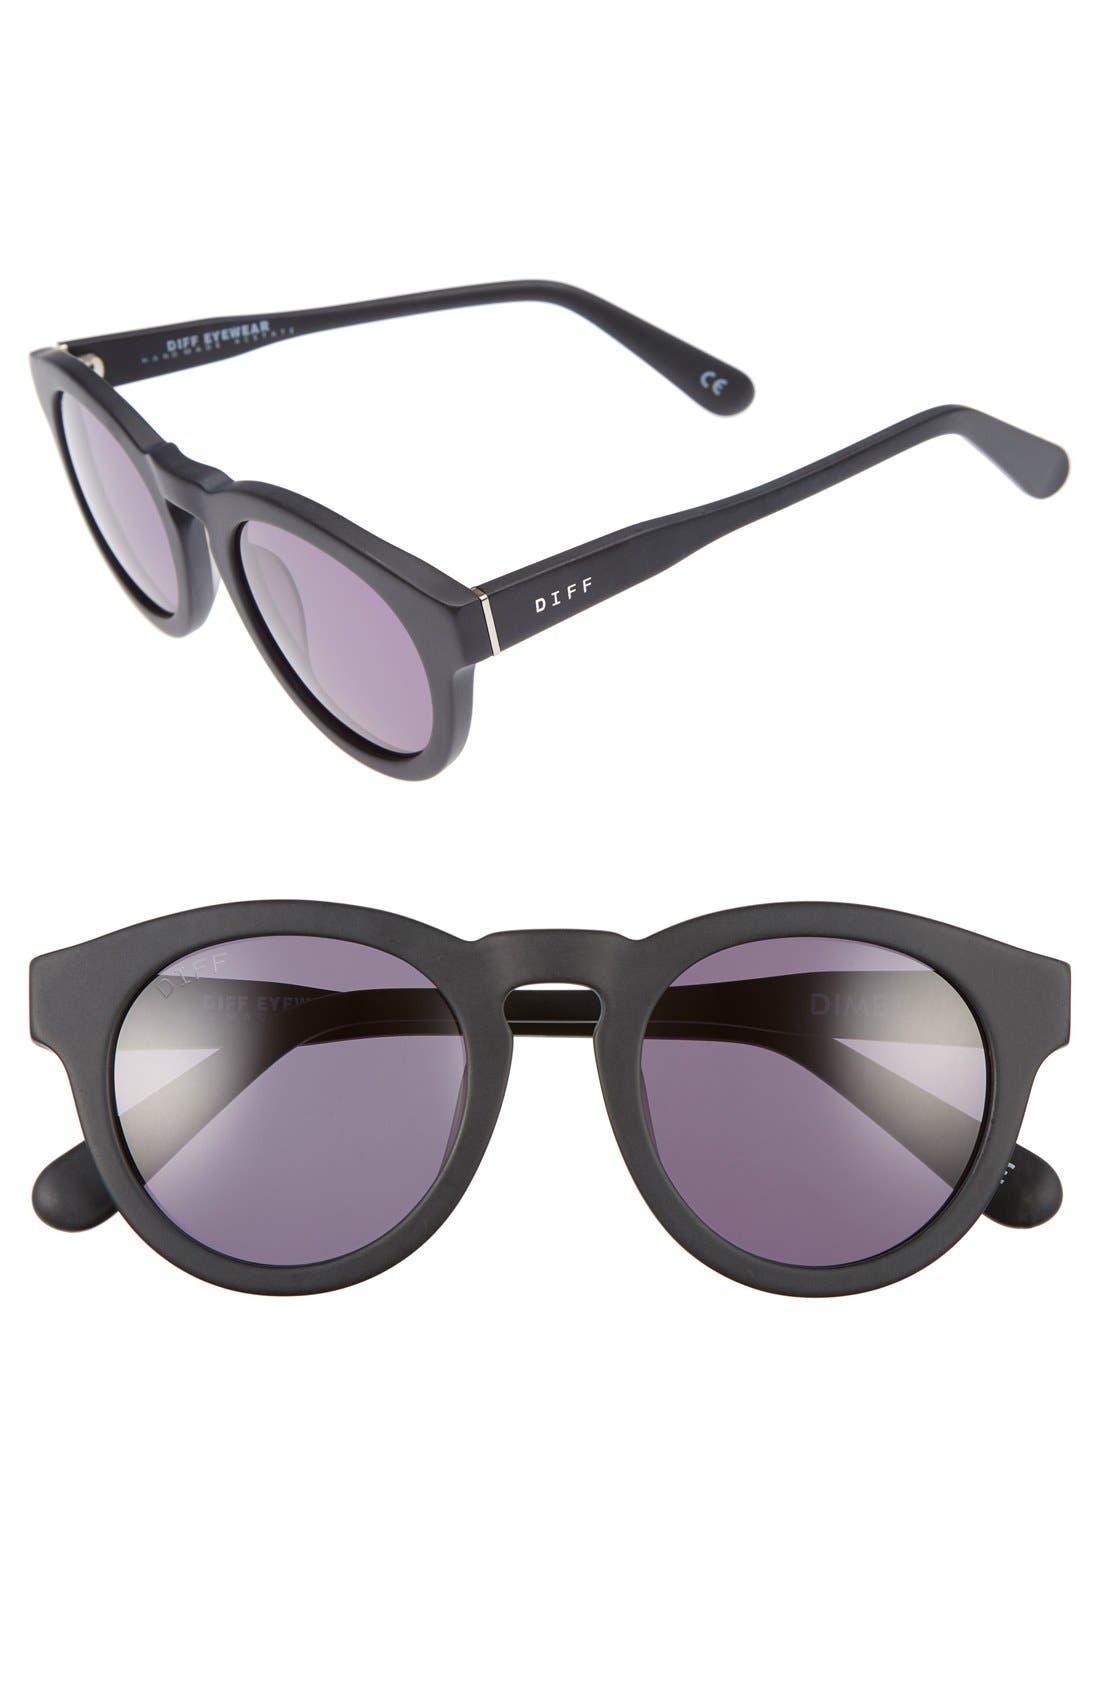 Alternate Image 1 Selected - DIFF Dime II 48mm Retro Sunglasses